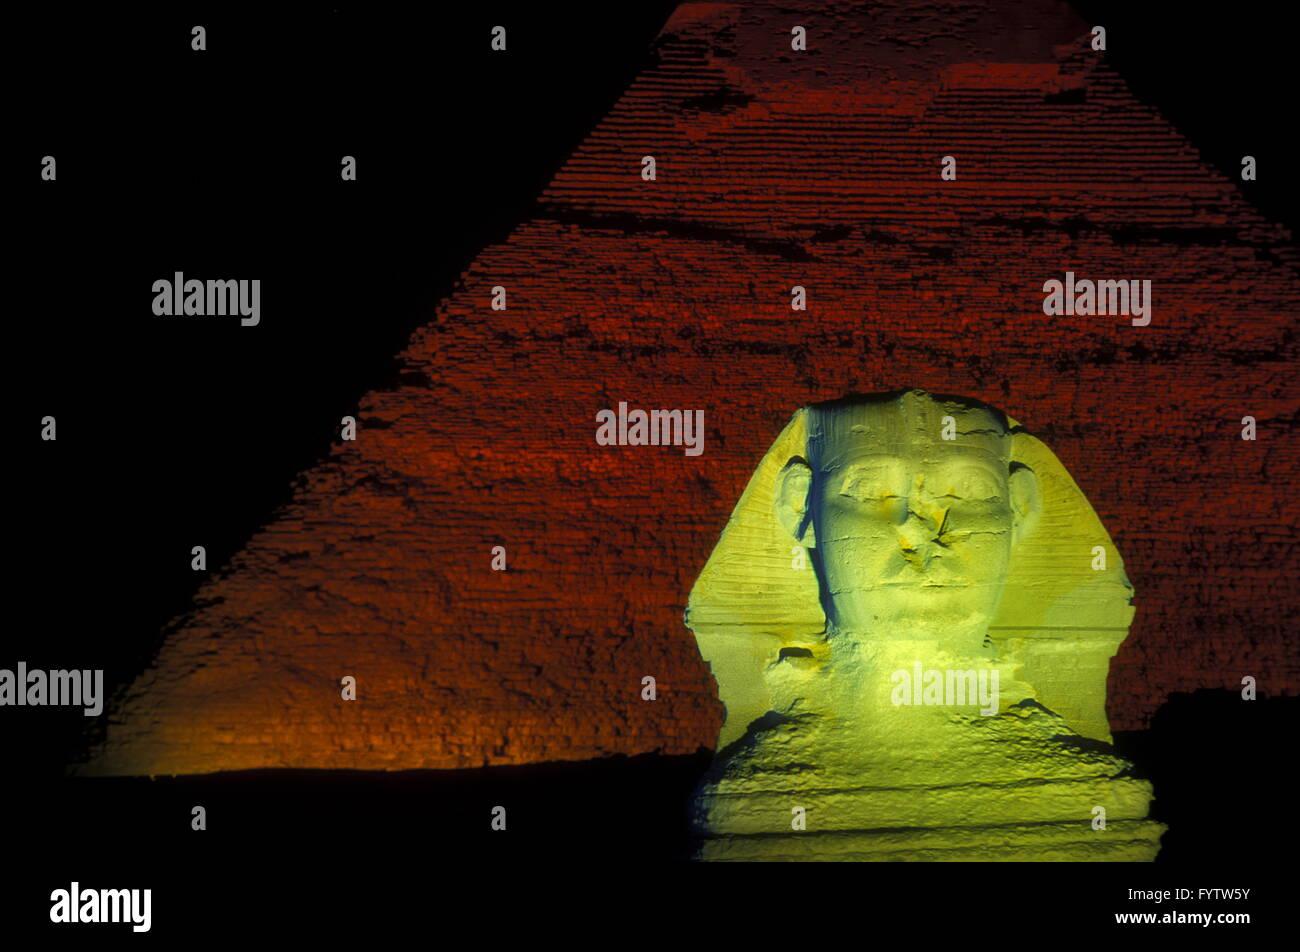 AFRICA EGYPT CAIRO GIZA PYRAMIDS - Stock Image